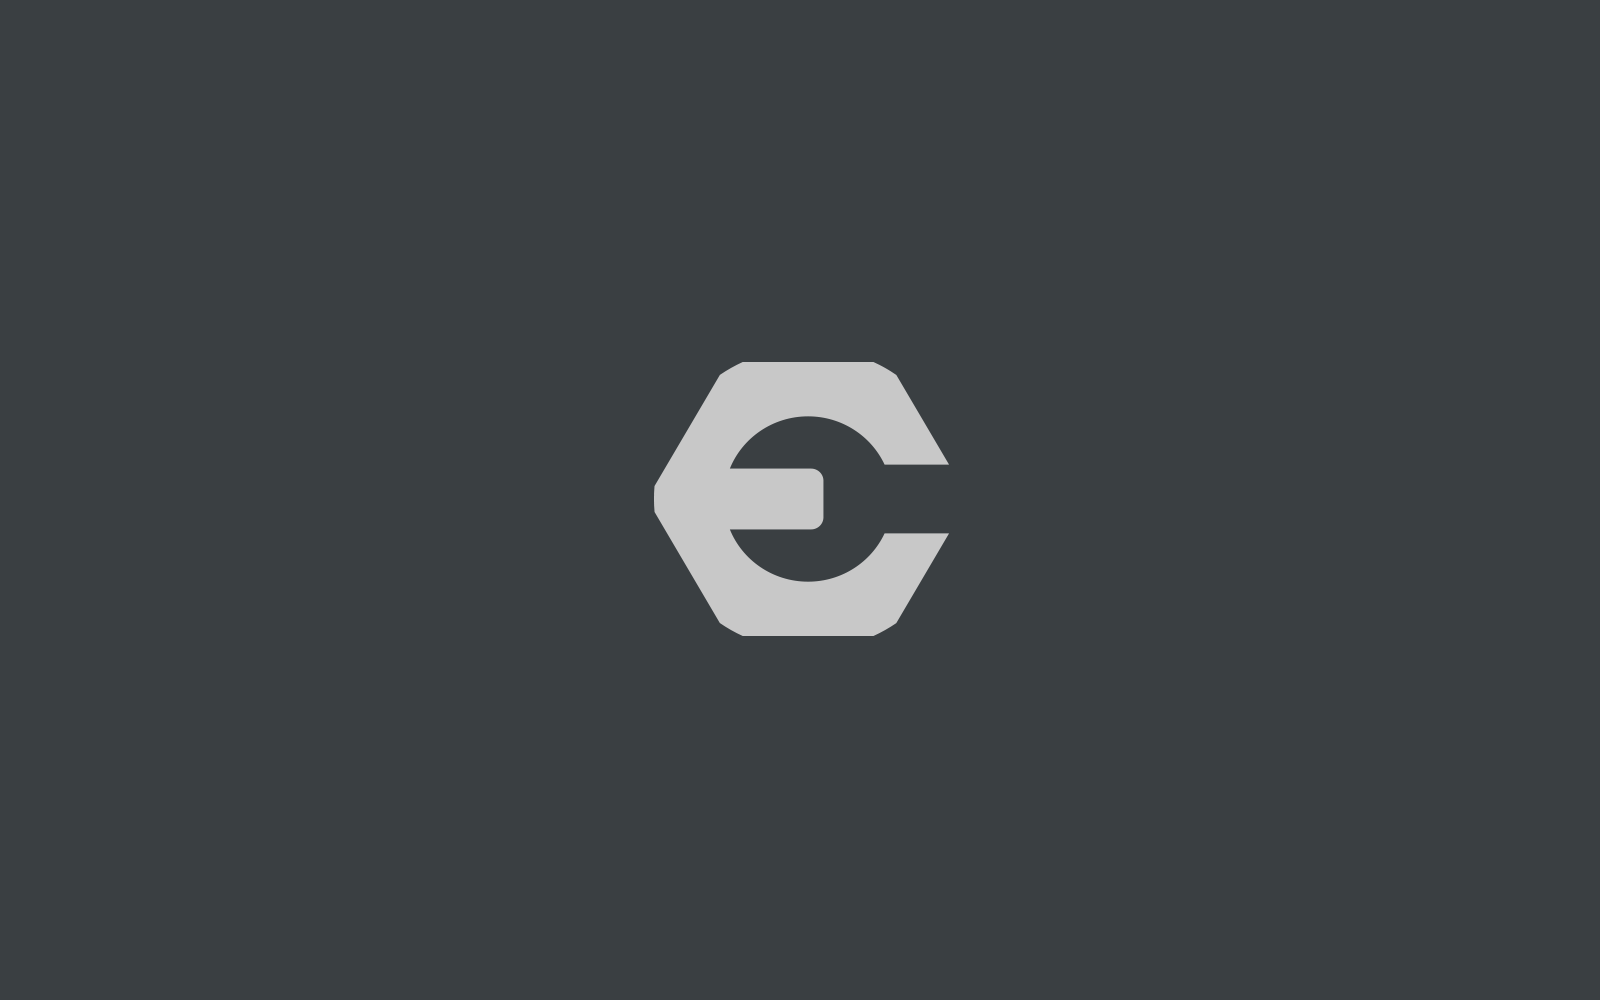 logo_1600p_tool